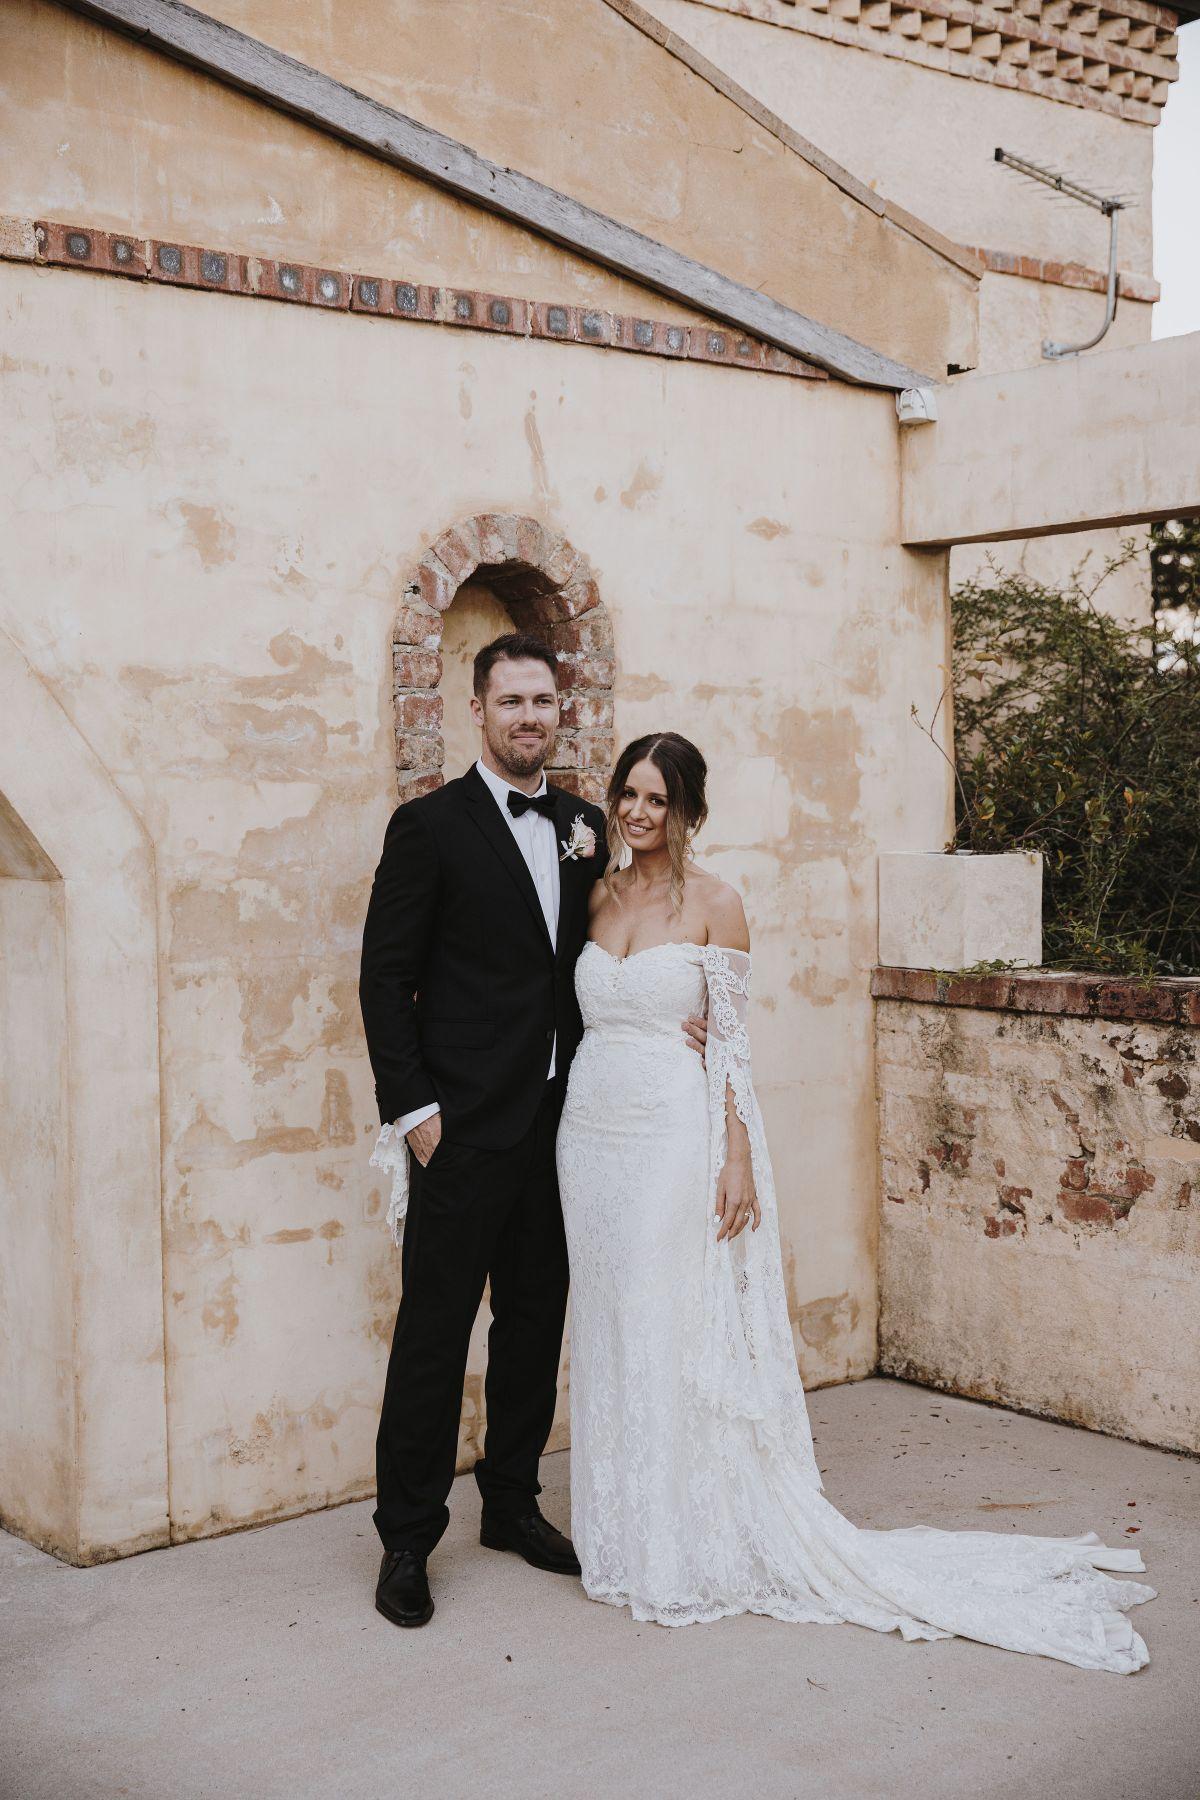 REAL WEDDING: BENA + MARK | DEUX BELETTES WEDDING BYRON BAY NSW